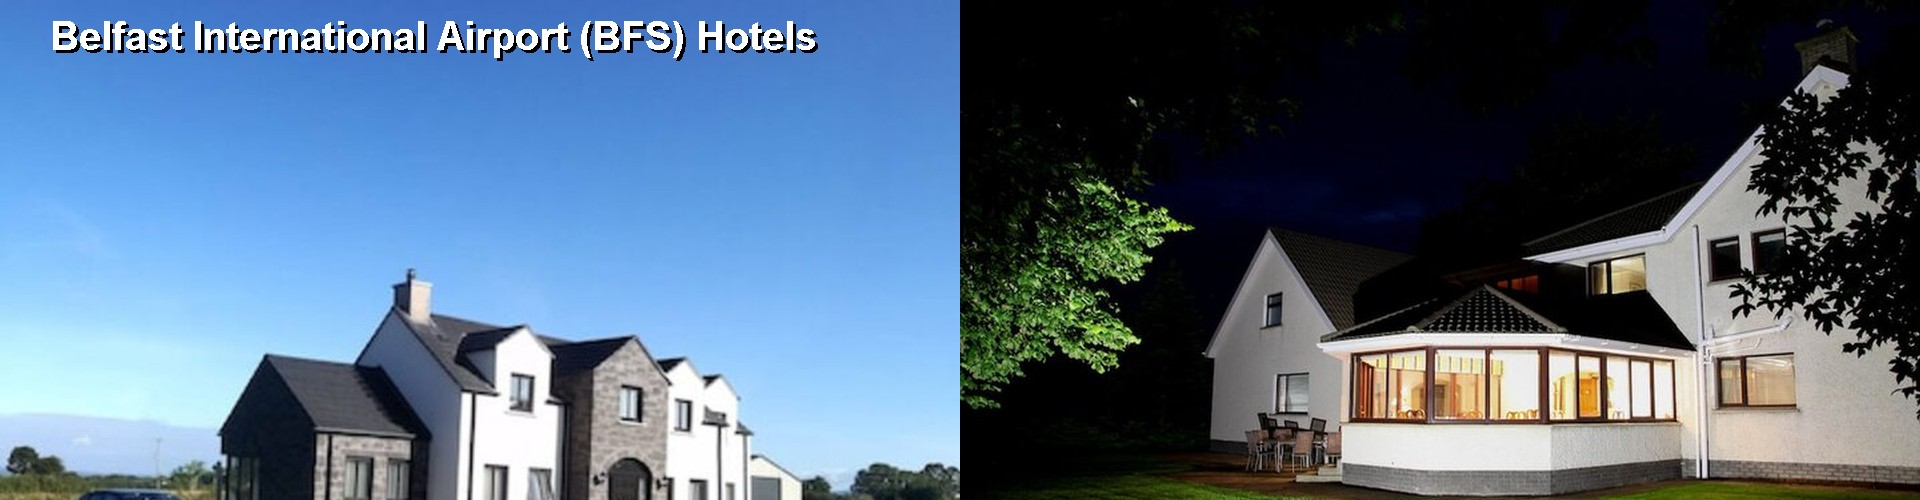 5 Best Hotels Near Belfast International Airport Bfs